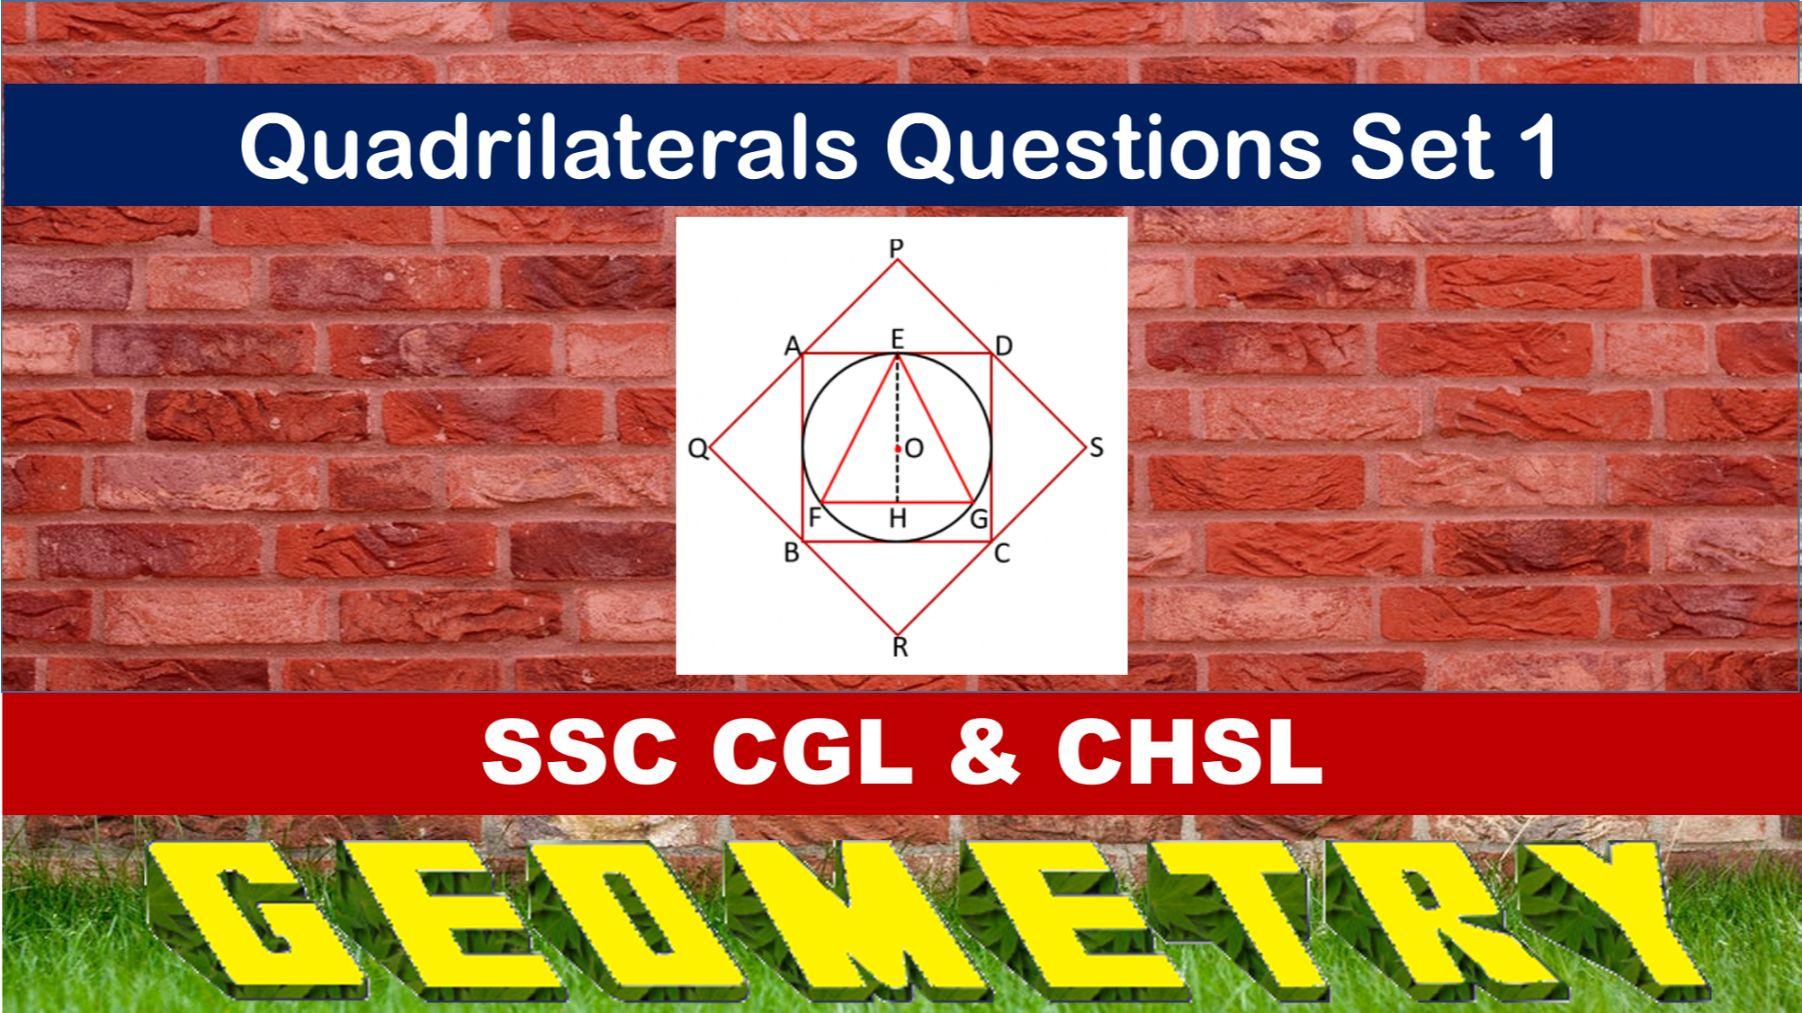 SSC CGL Geometry Quadrilaterals Set 1